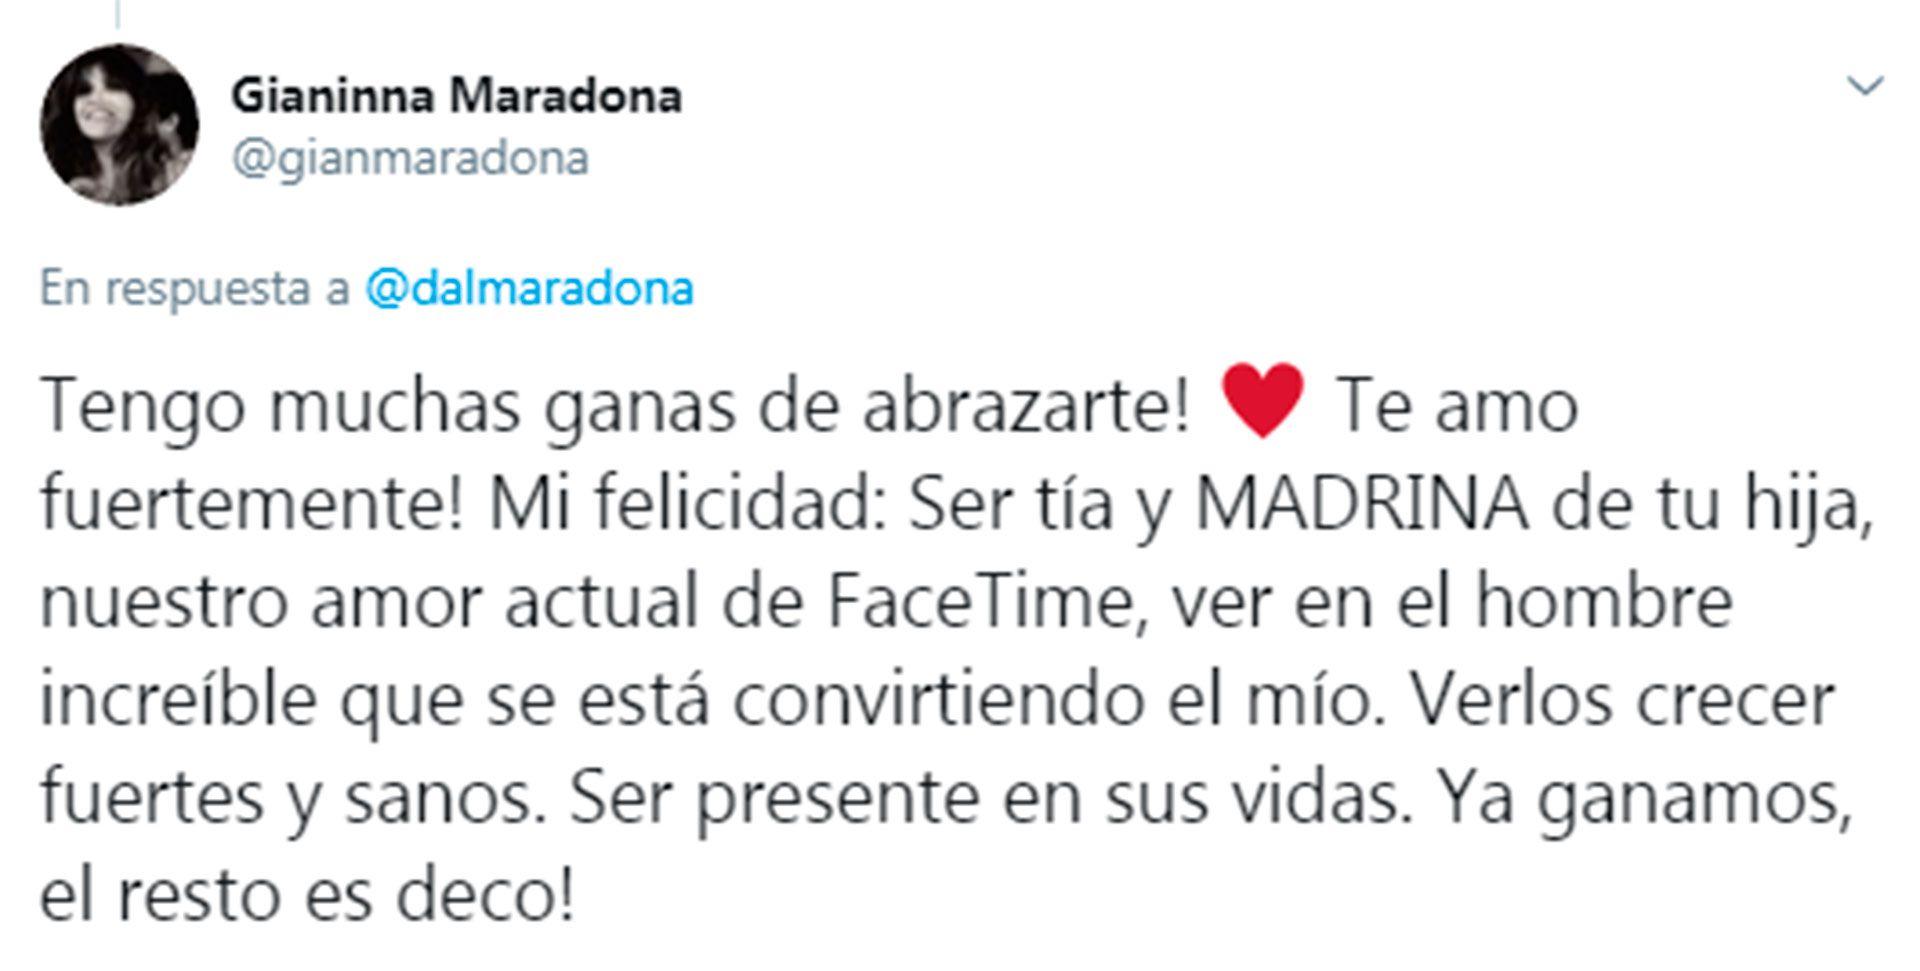 Mensaje de Gianinna Maradona